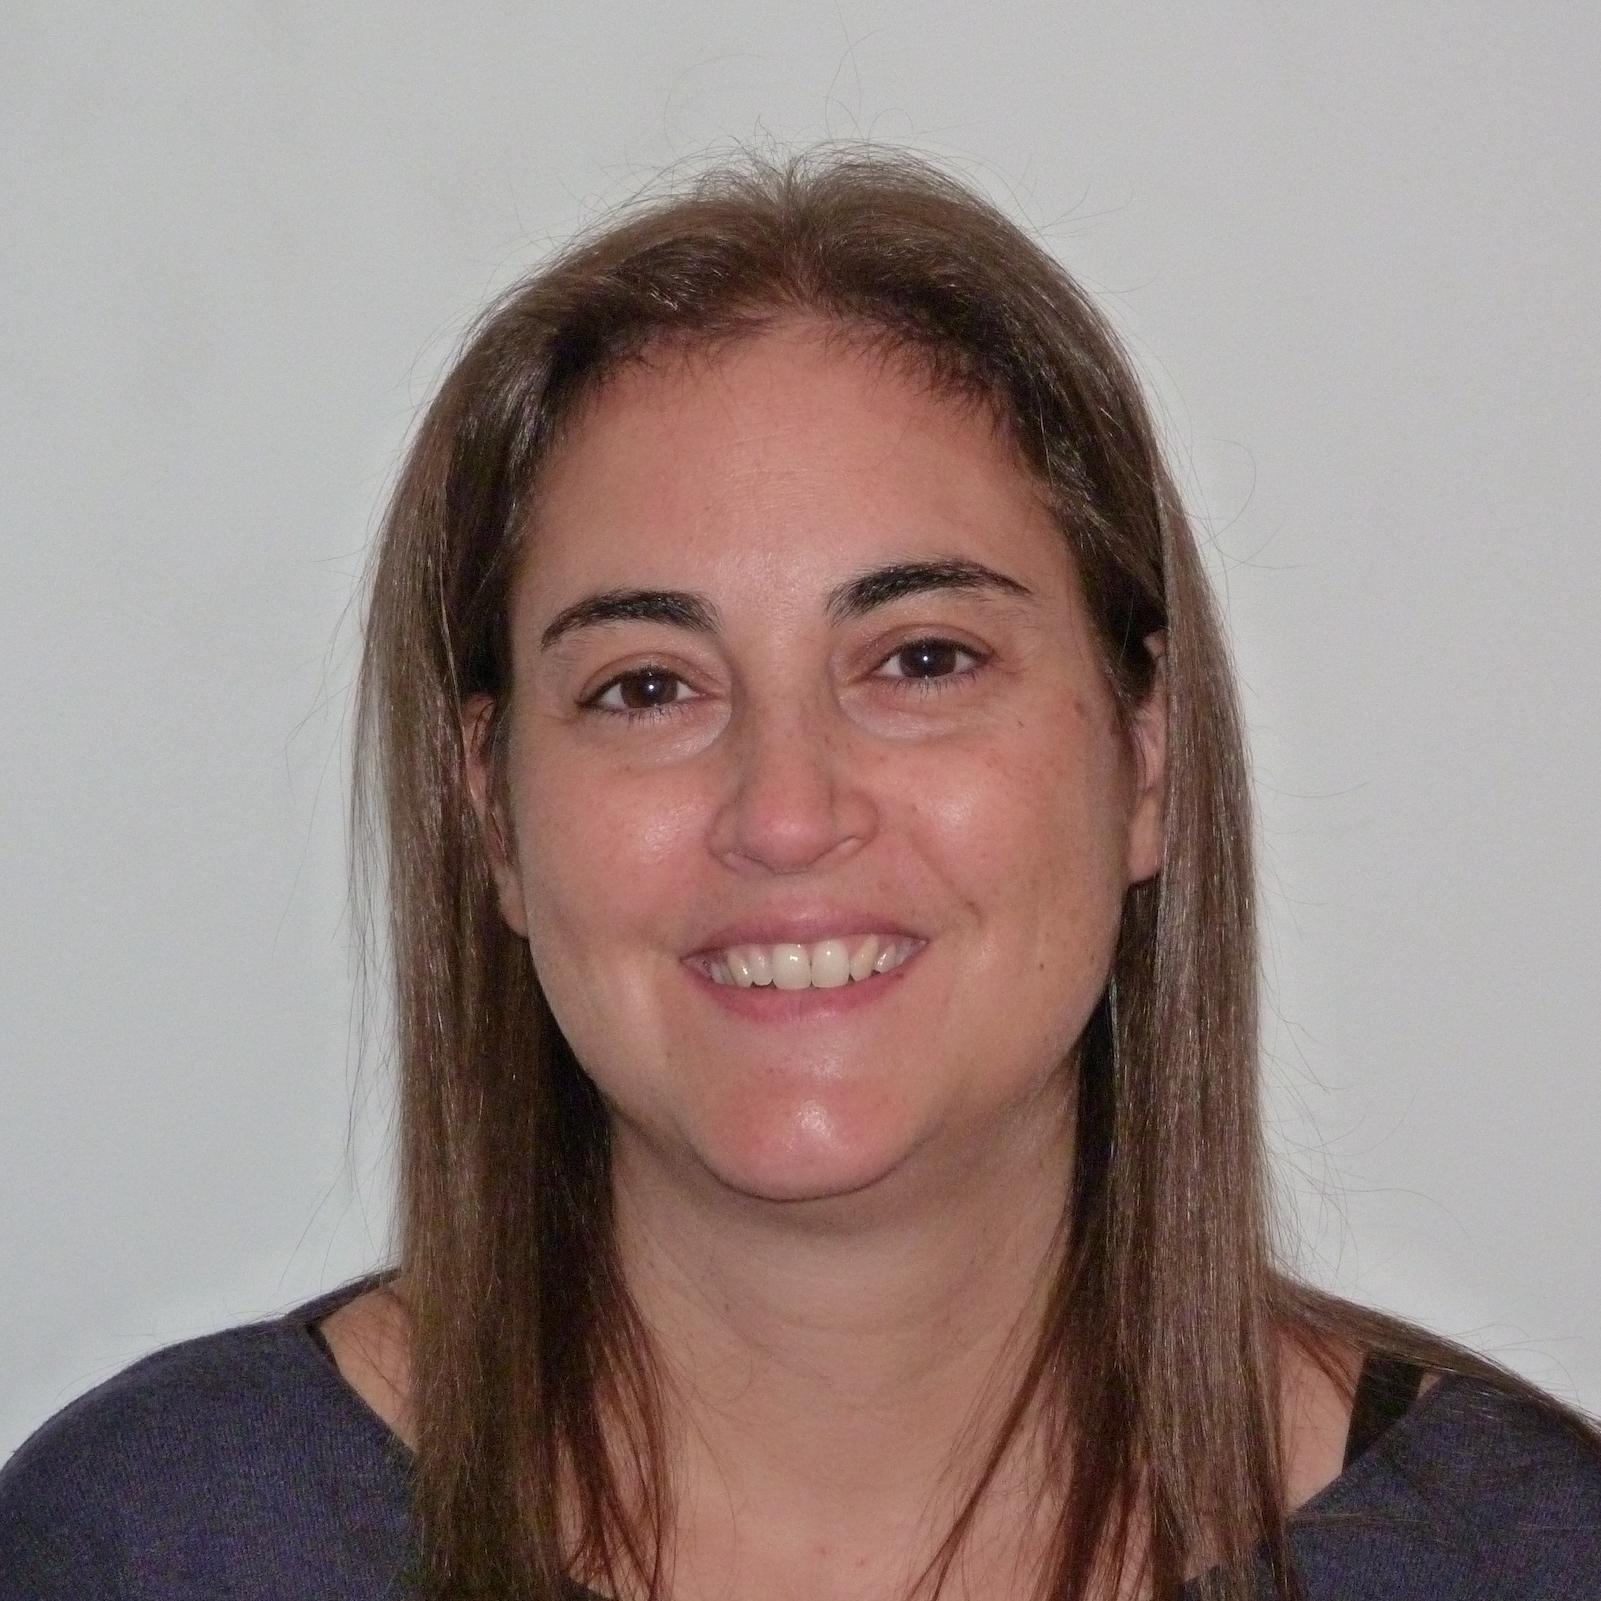 Dr. Sara Paiva, PhD